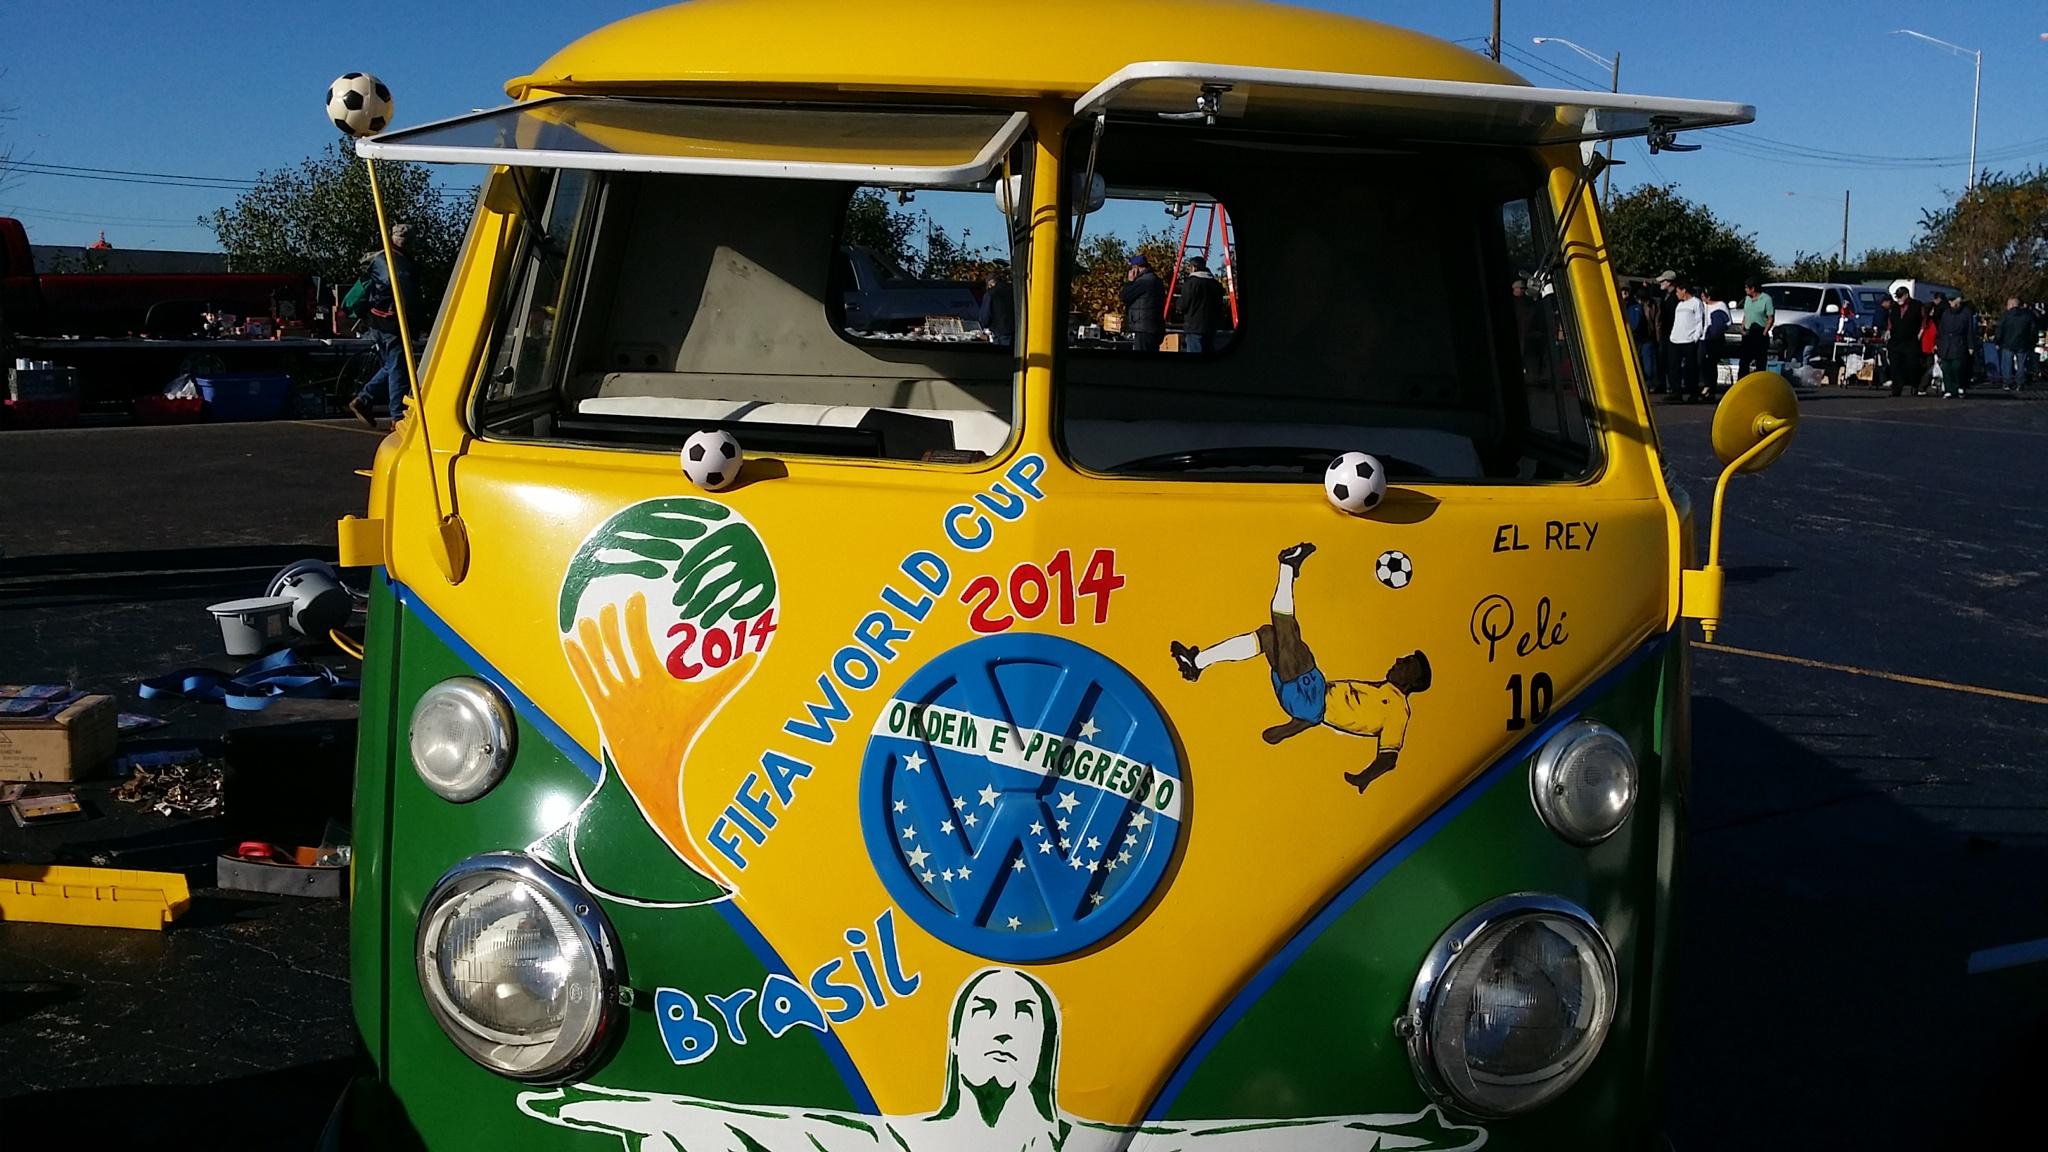 Vintage VA Volkswagen Van Brazil Pele Soccer  by THETOYSTALKER